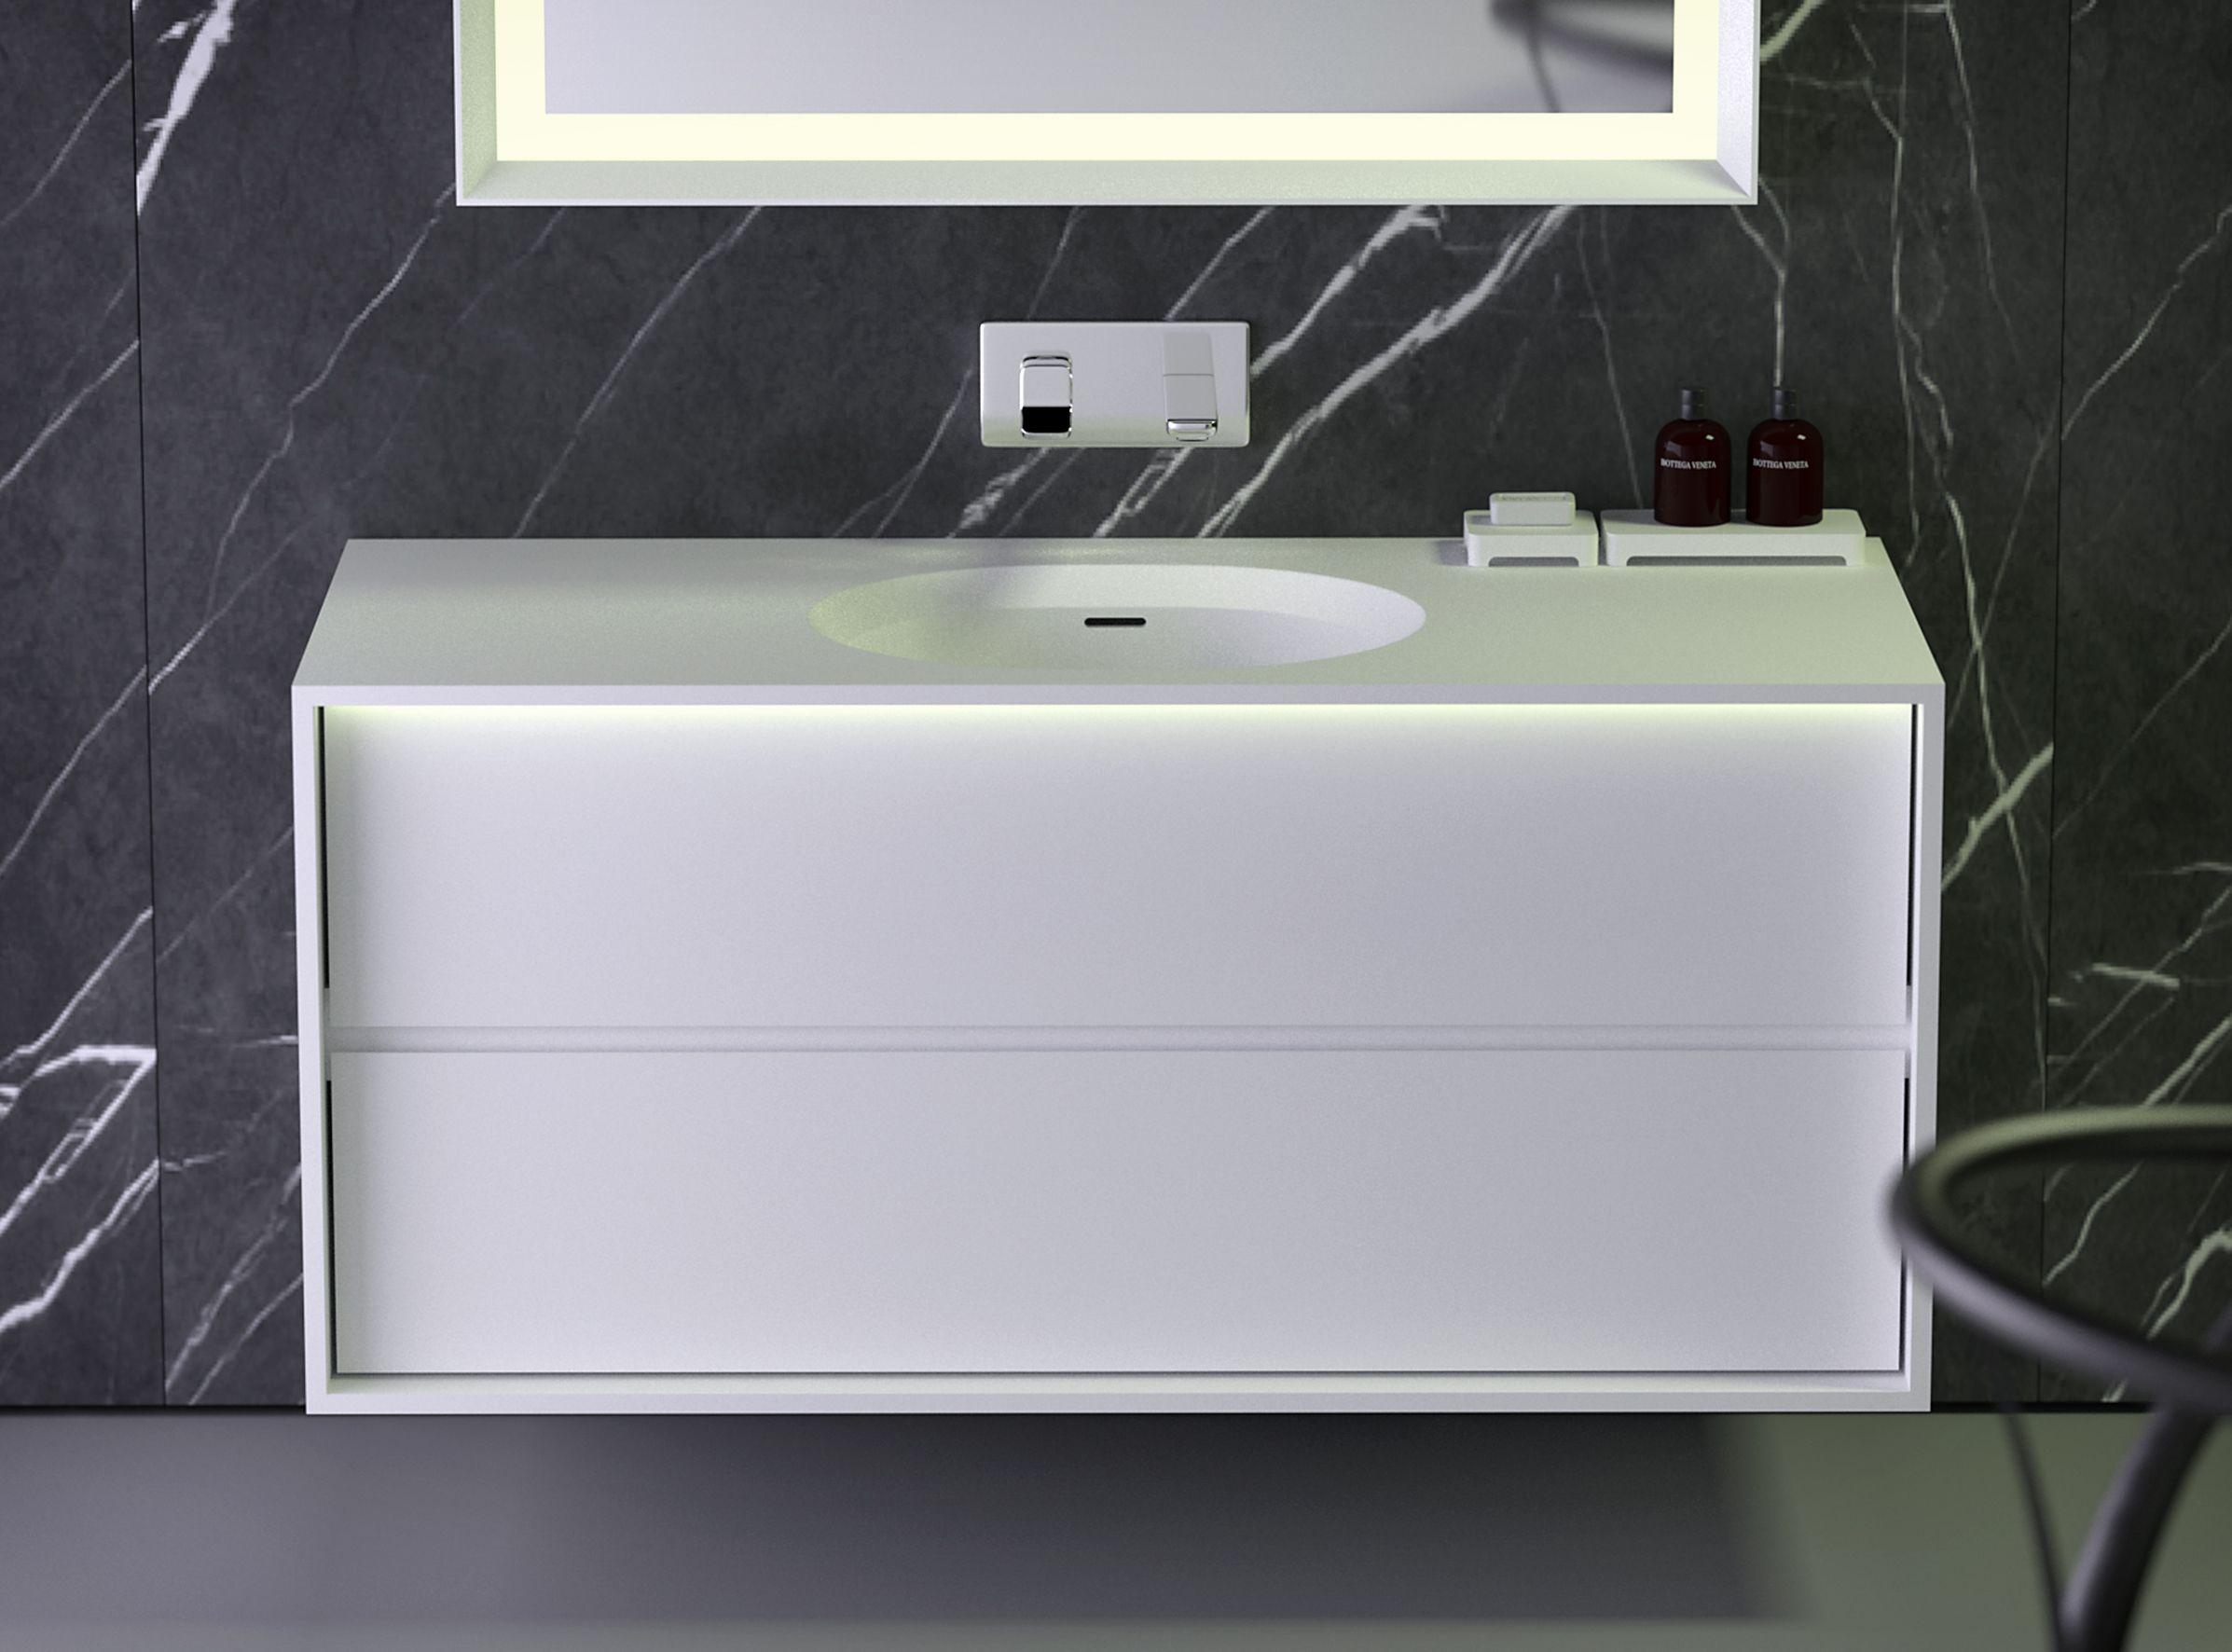 Interior bathroom modern bathroom basins - Knief K Stone Collection Strip Flush Mounted Wash Basin And Wall Hung Cabinet With Drawers Modern Bathrooms Interiorbathroom